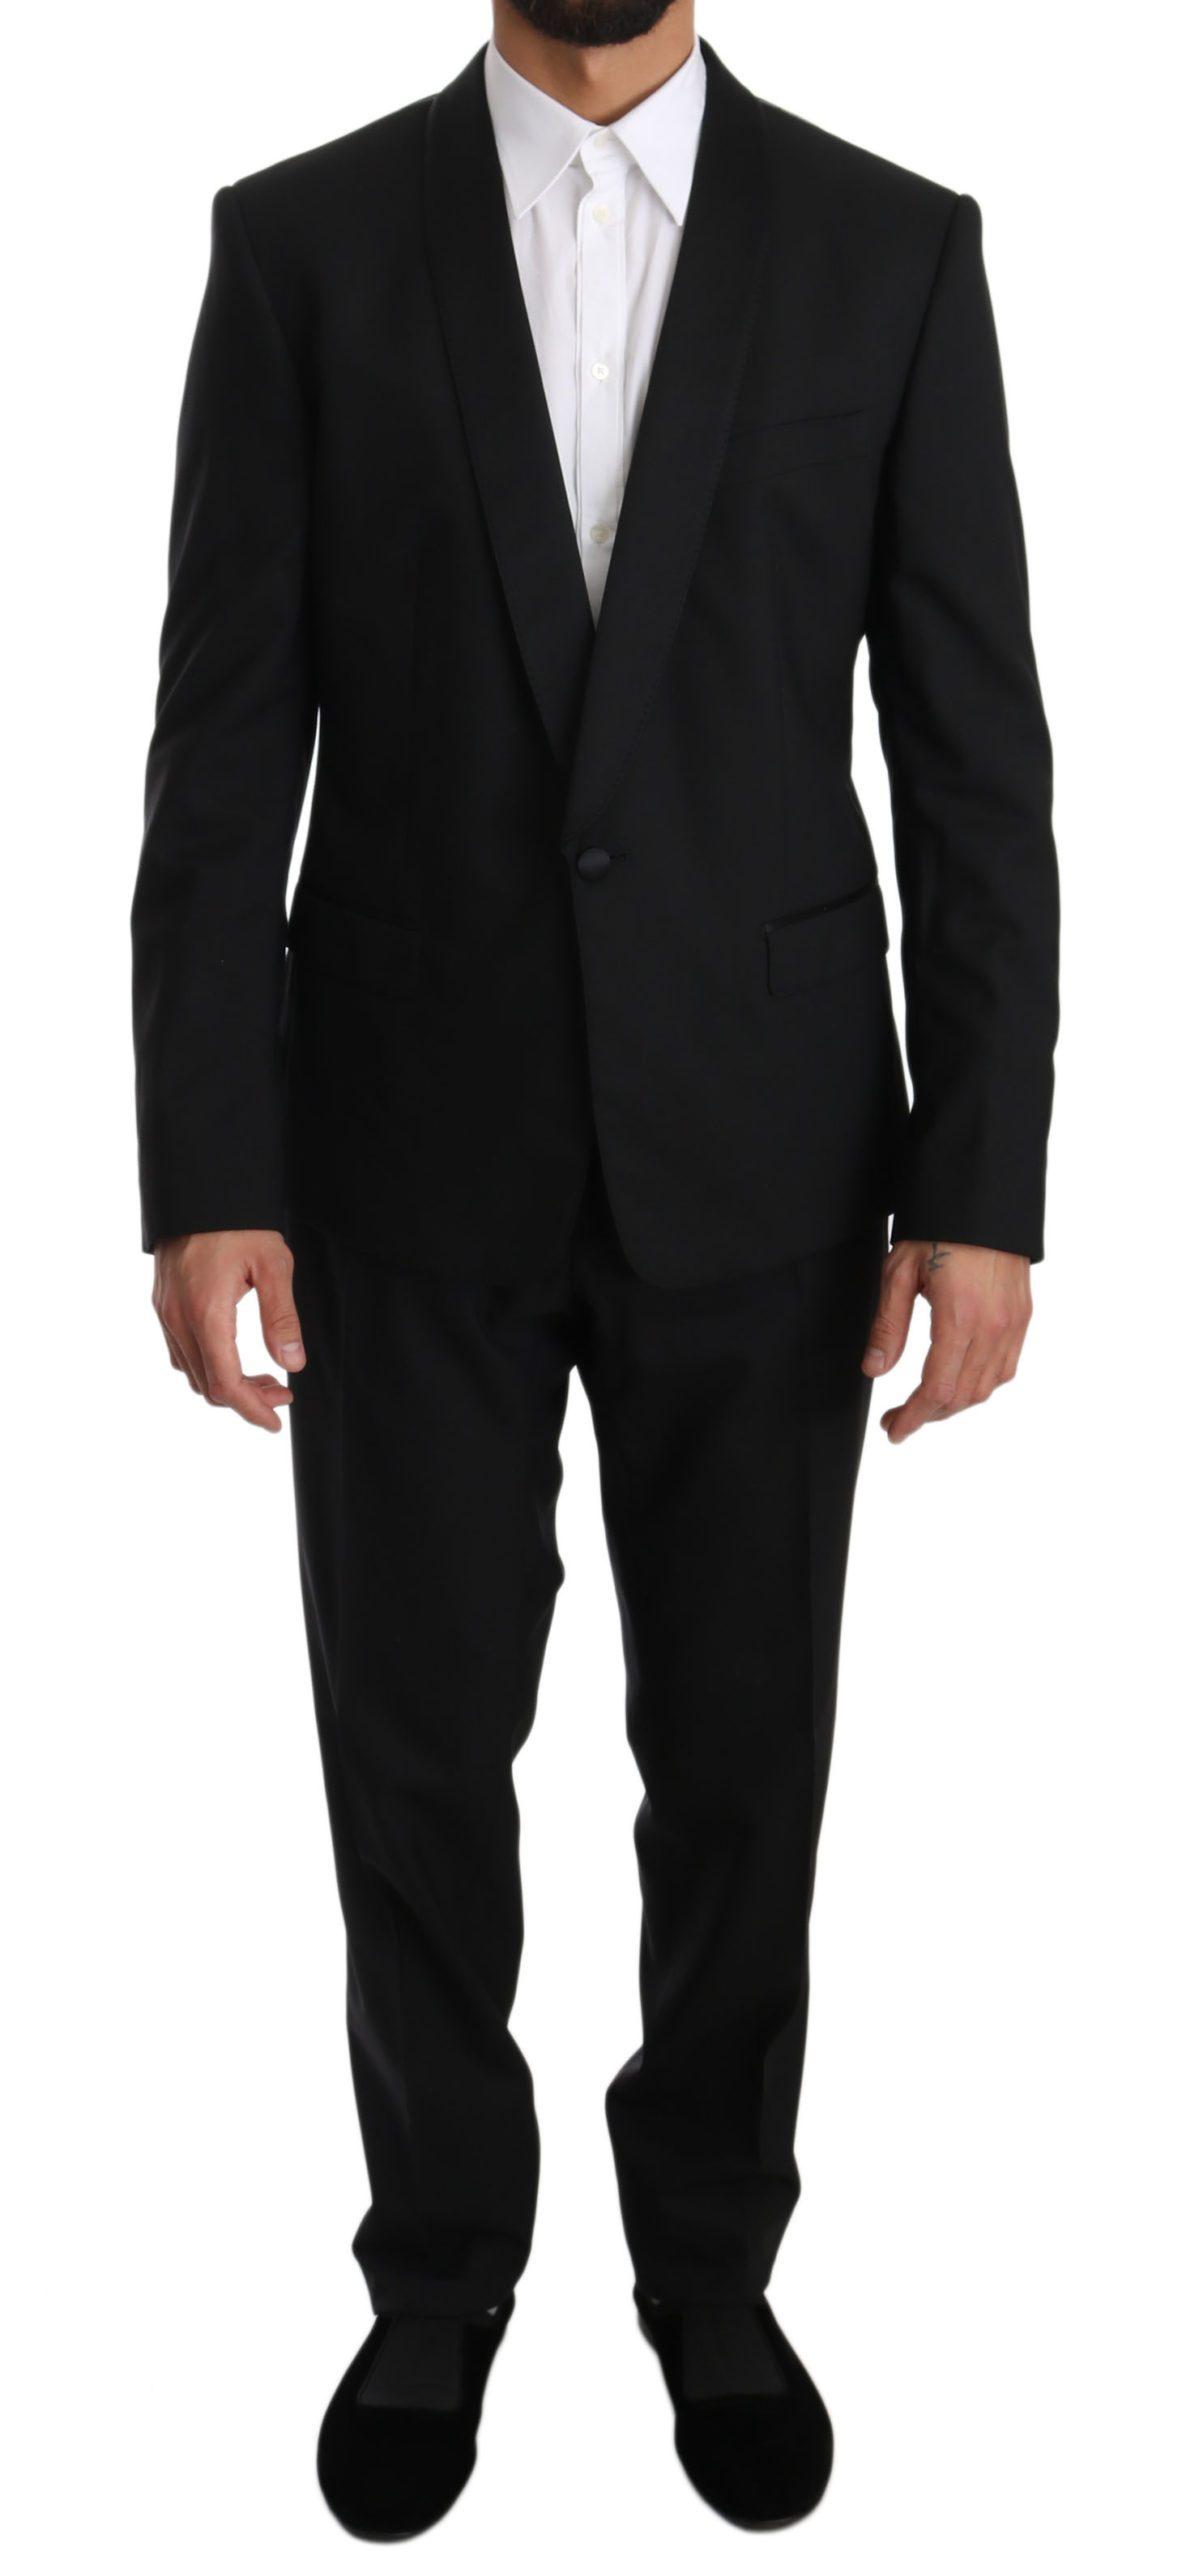 Dolce & Gabbana Men's Wool One Button Slim Martini Suit Black KOS1300 - IT52 | L